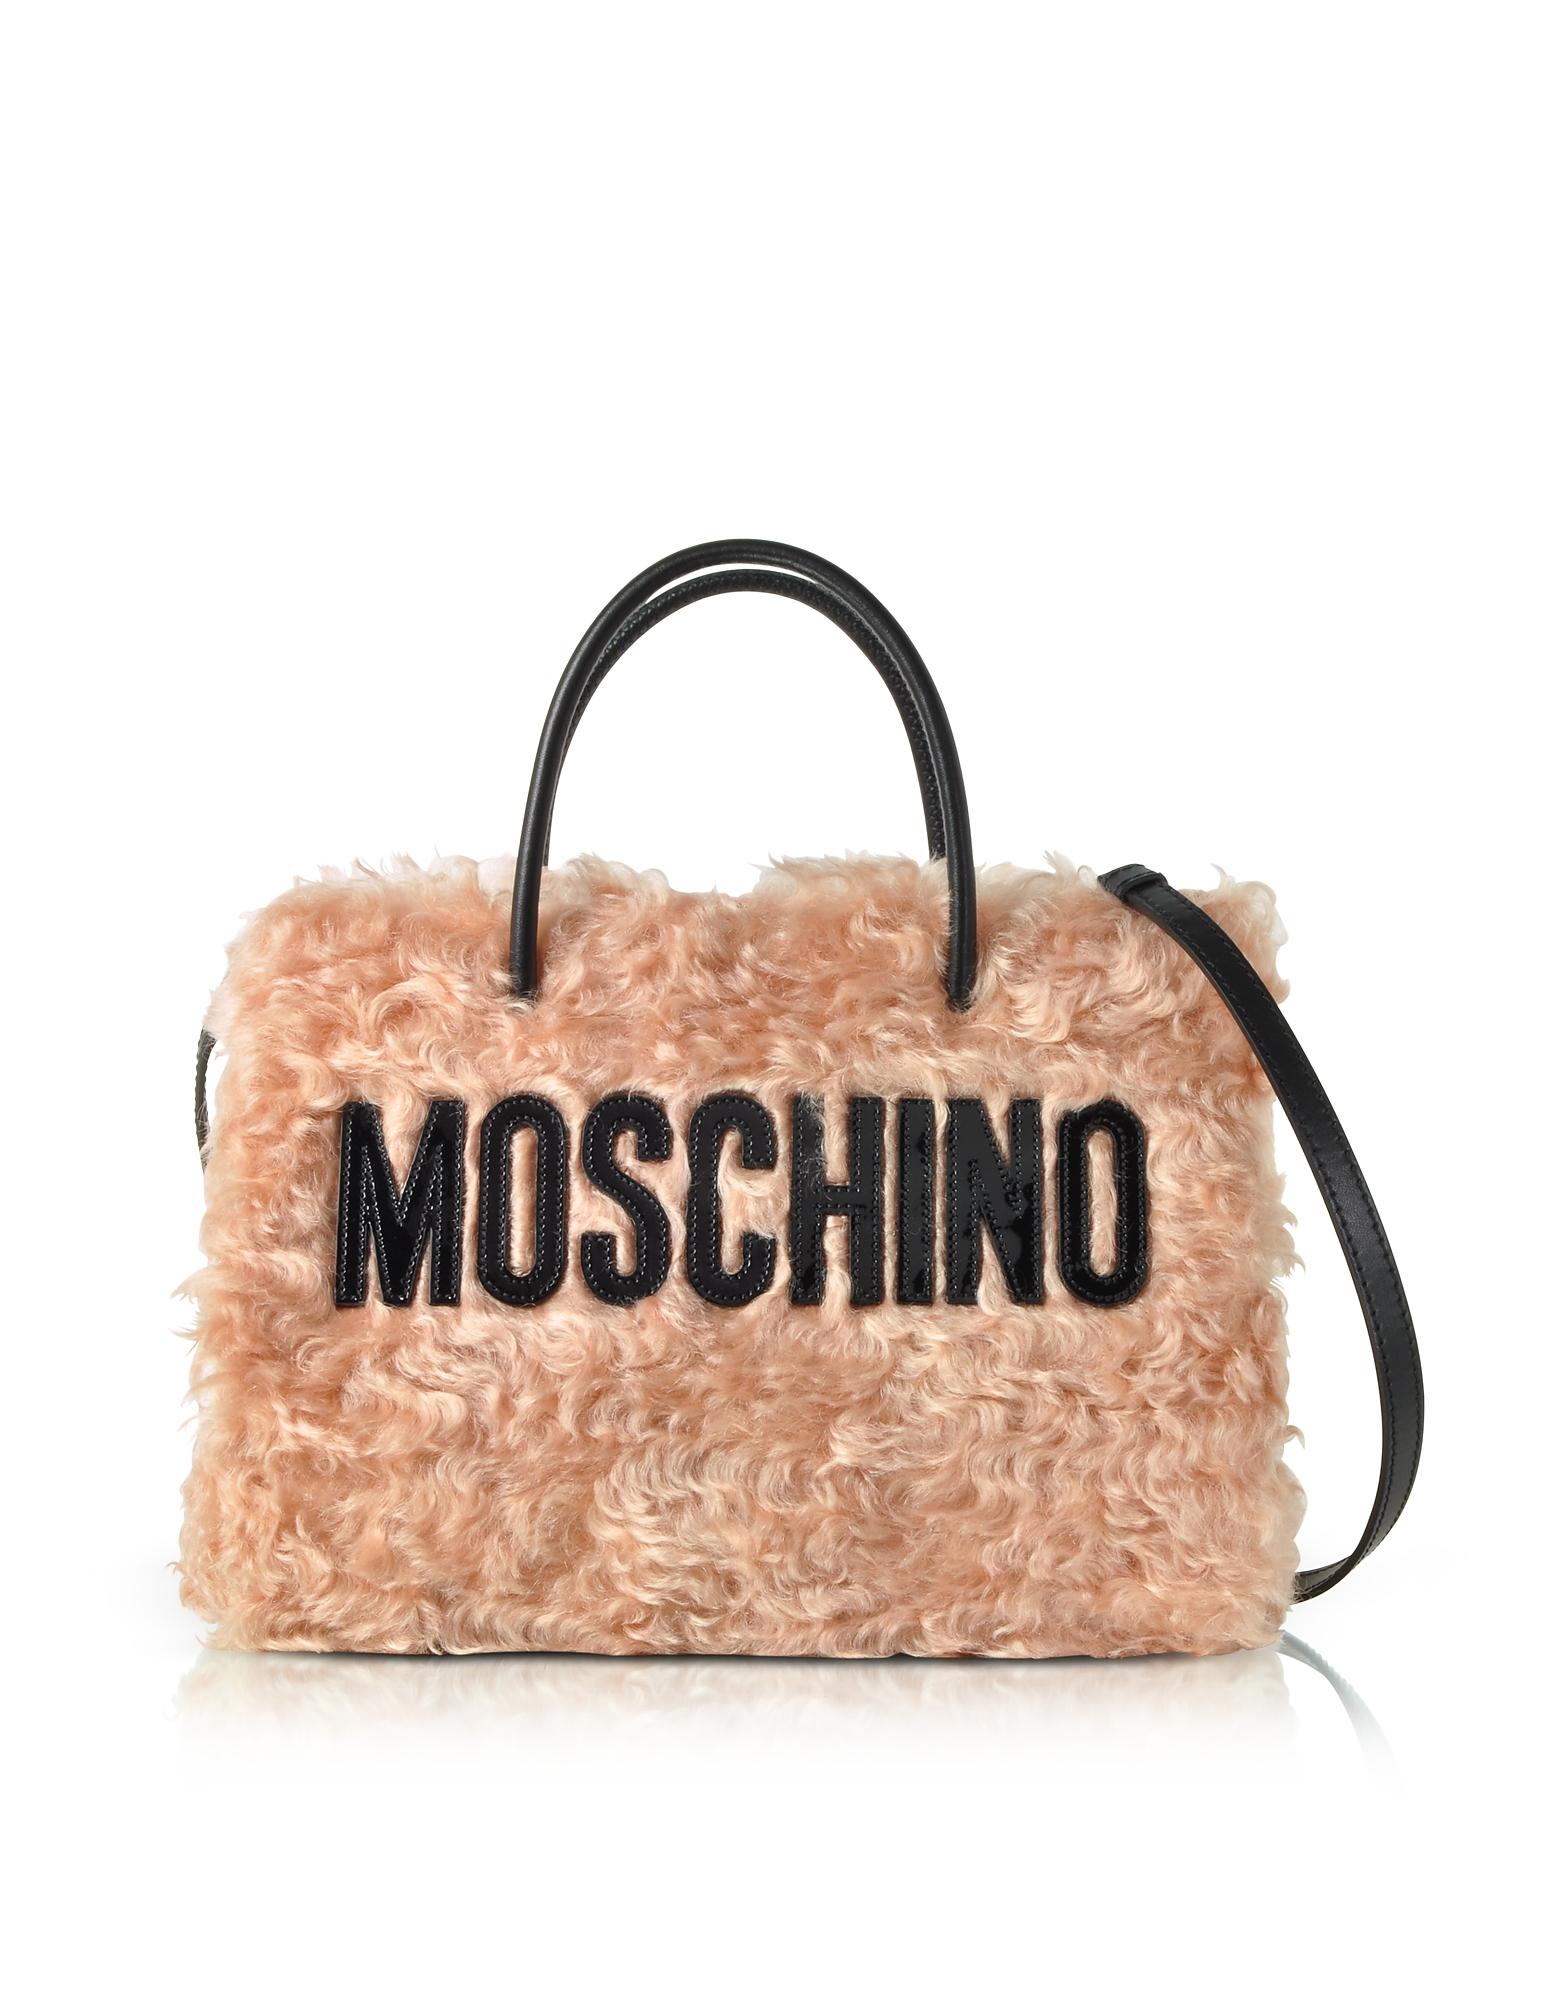 Moschino Handbags, Pink Fleece Signature Tote Bag